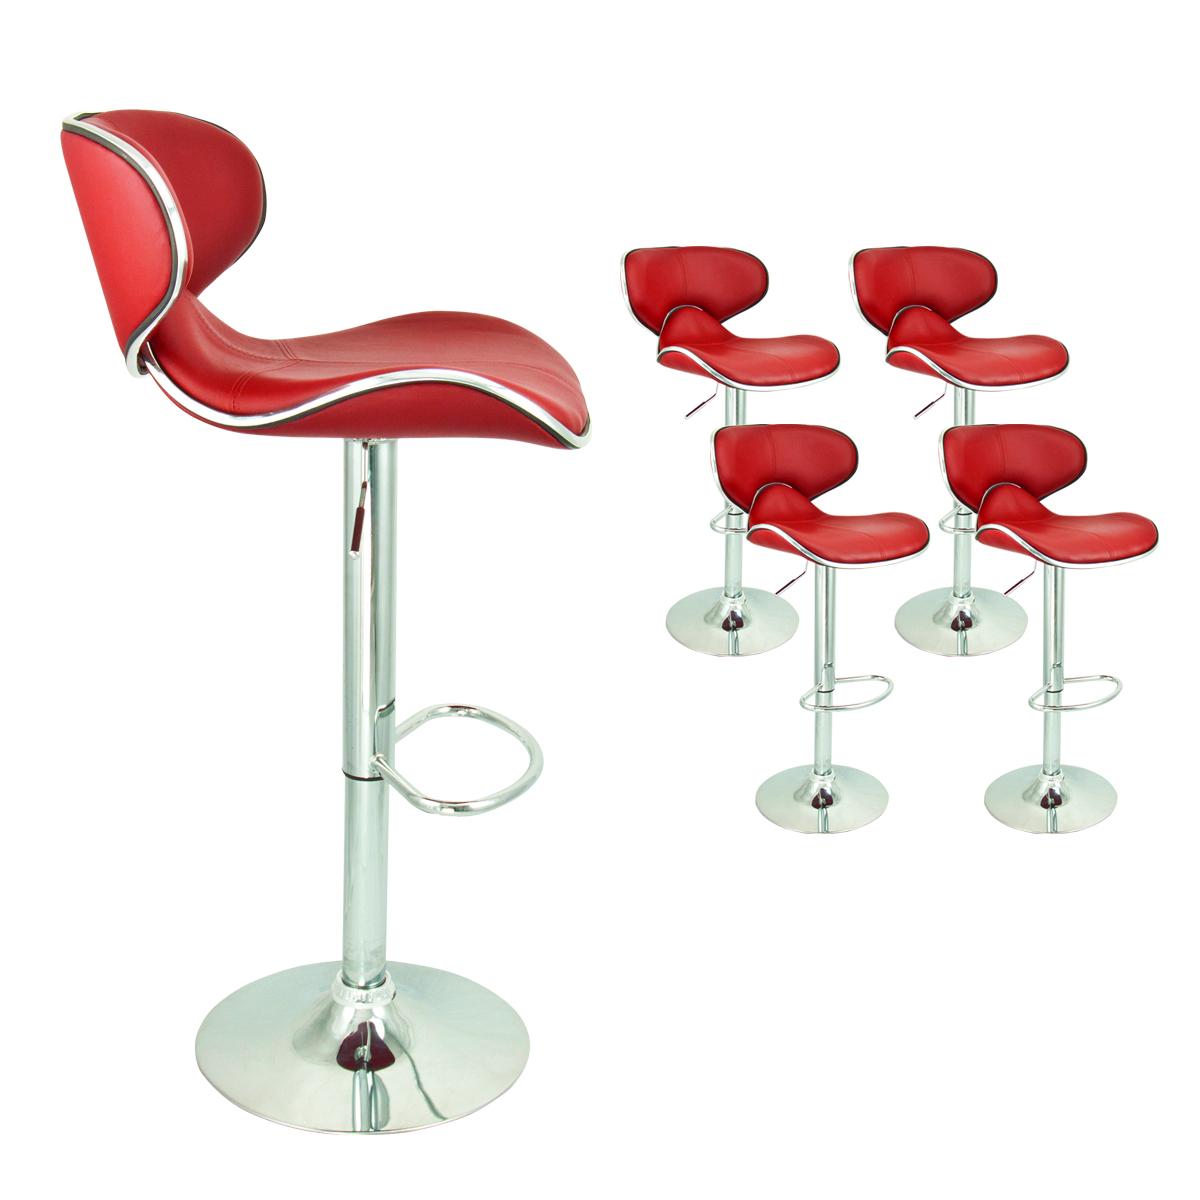 4 Red Modern Adjustable Barstool Swivel Elegant PU Leather  : 37851as from www.ebay.com size 1200 x 1200 jpeg 384kB